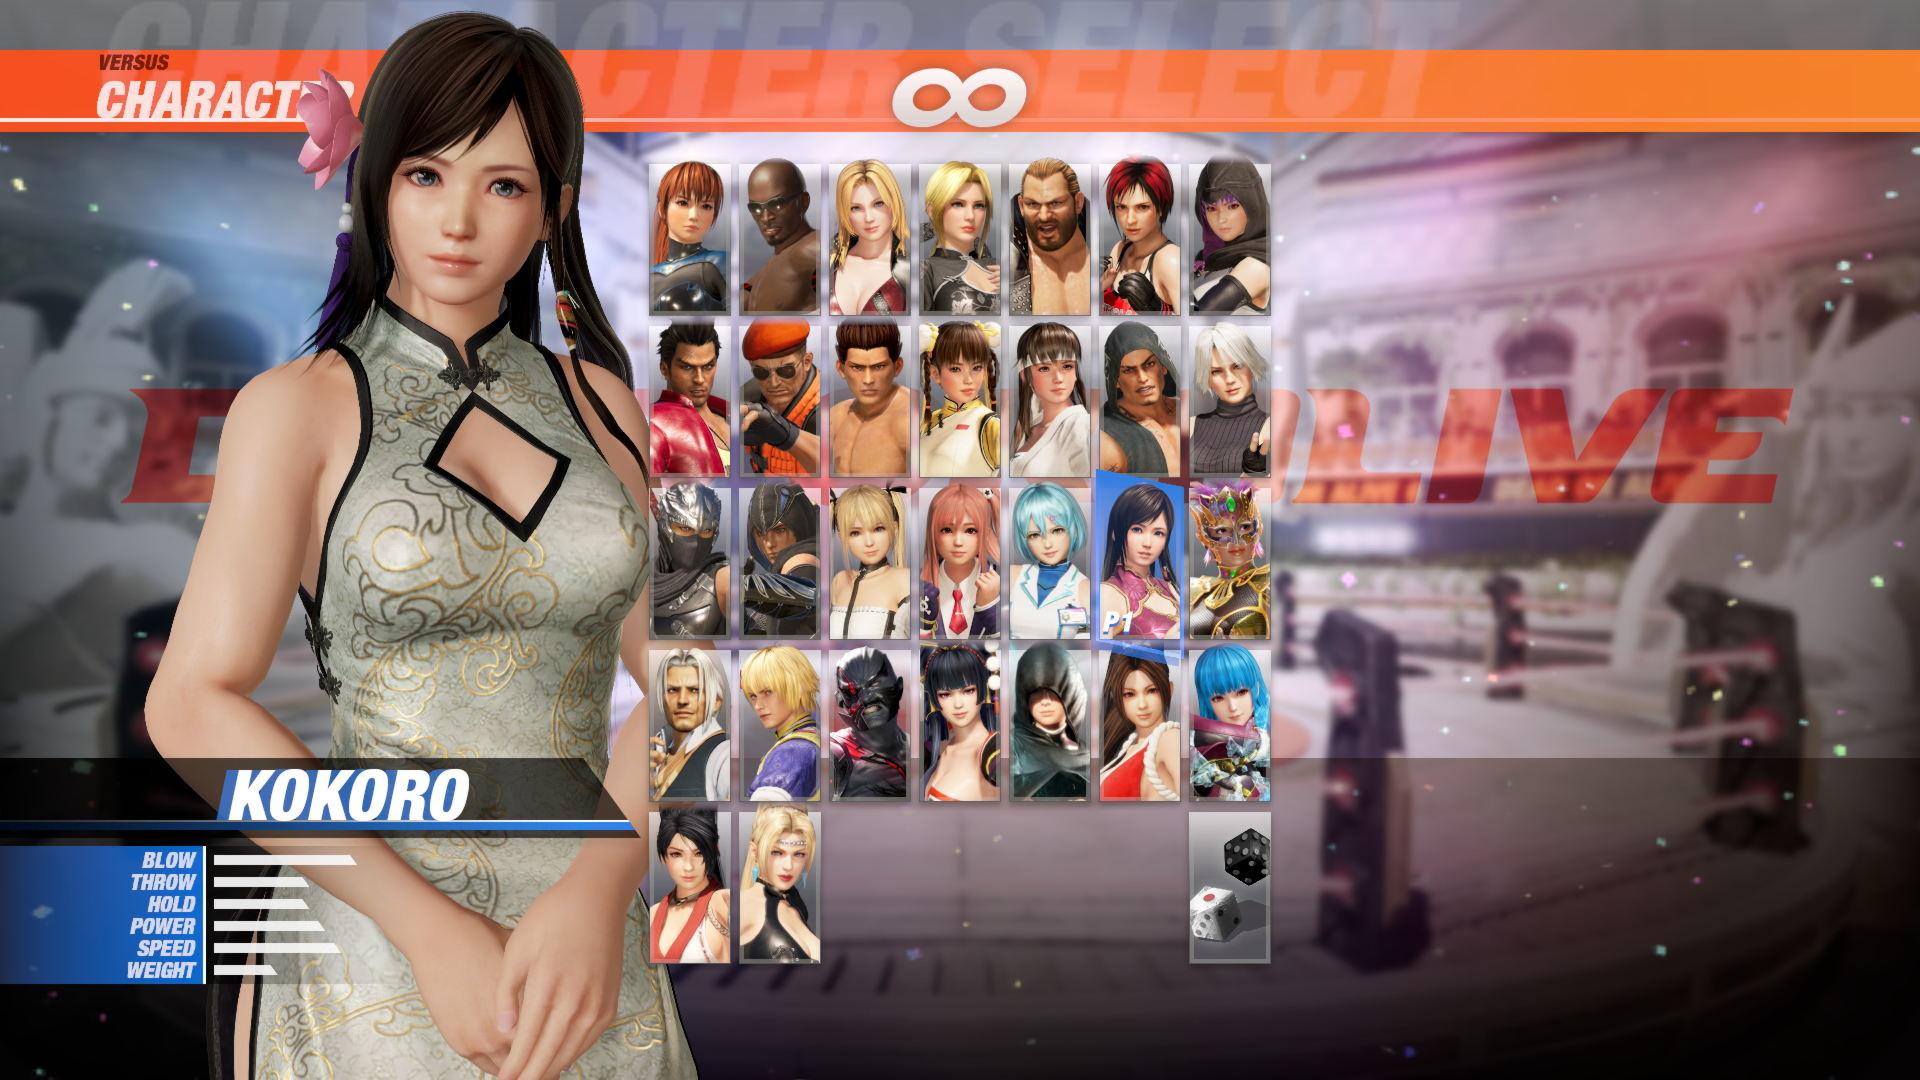 [Revival] DOA6 Alluring Mandarin Dress - Kokoro screenshot